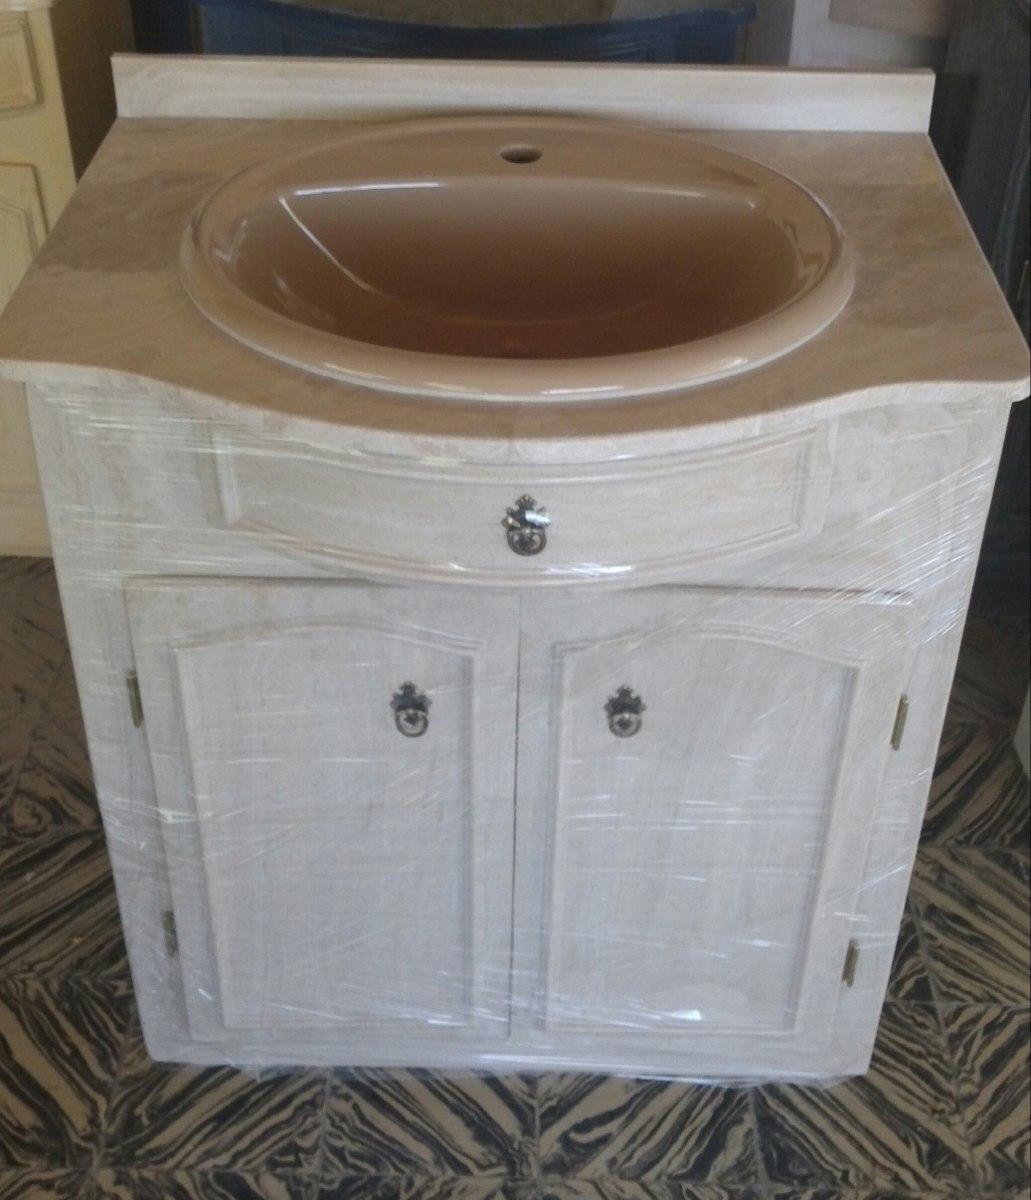 Mueble lavadero mercadolibre 20170807172532 for Lavatorio cocina